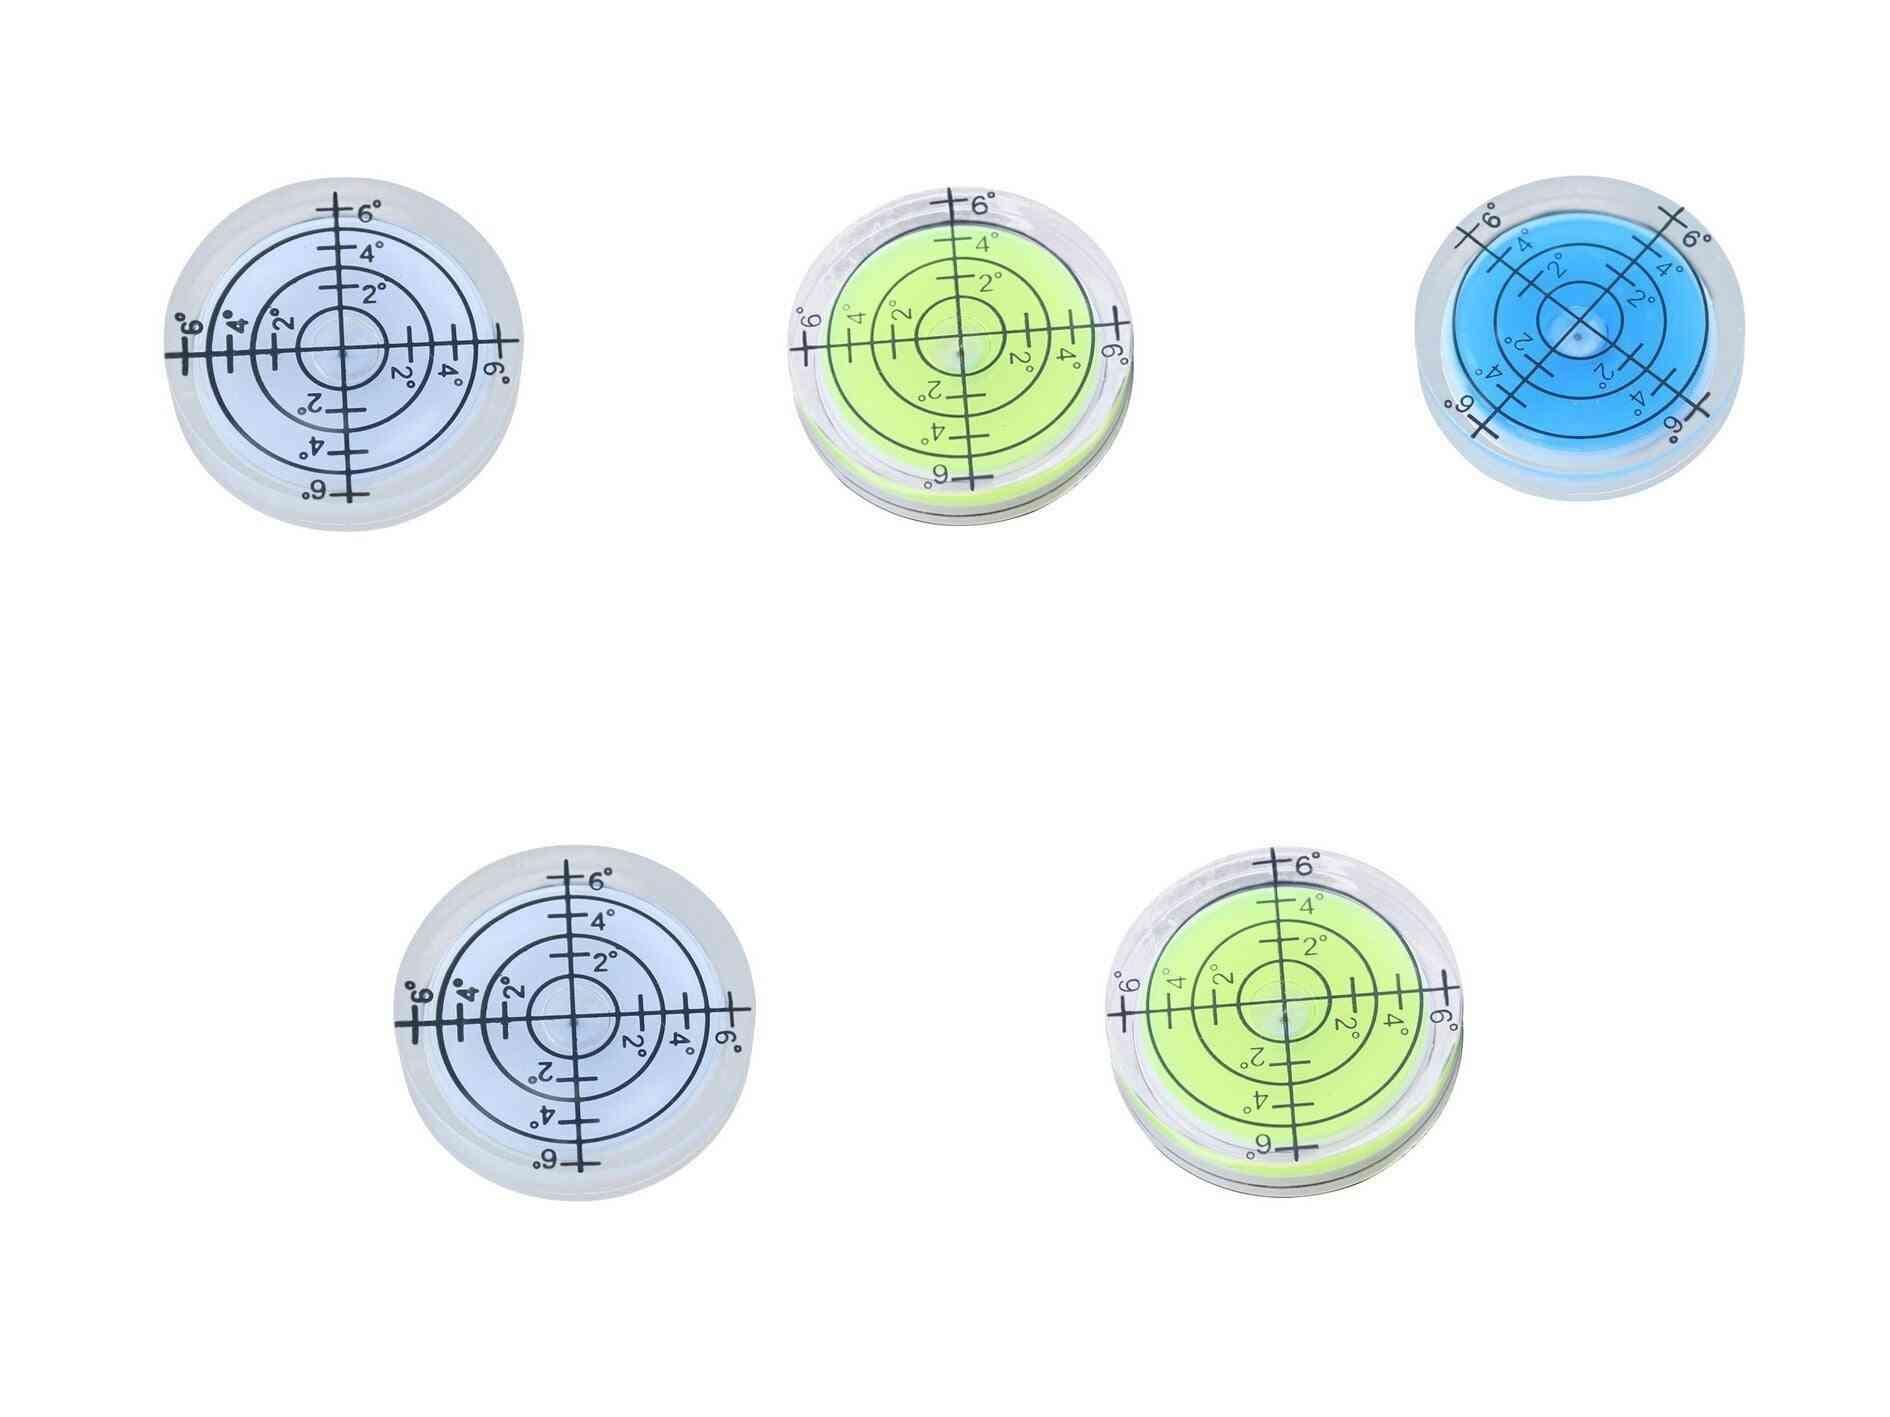 Bubble Level Round Level Bubble Measuring  Accessories